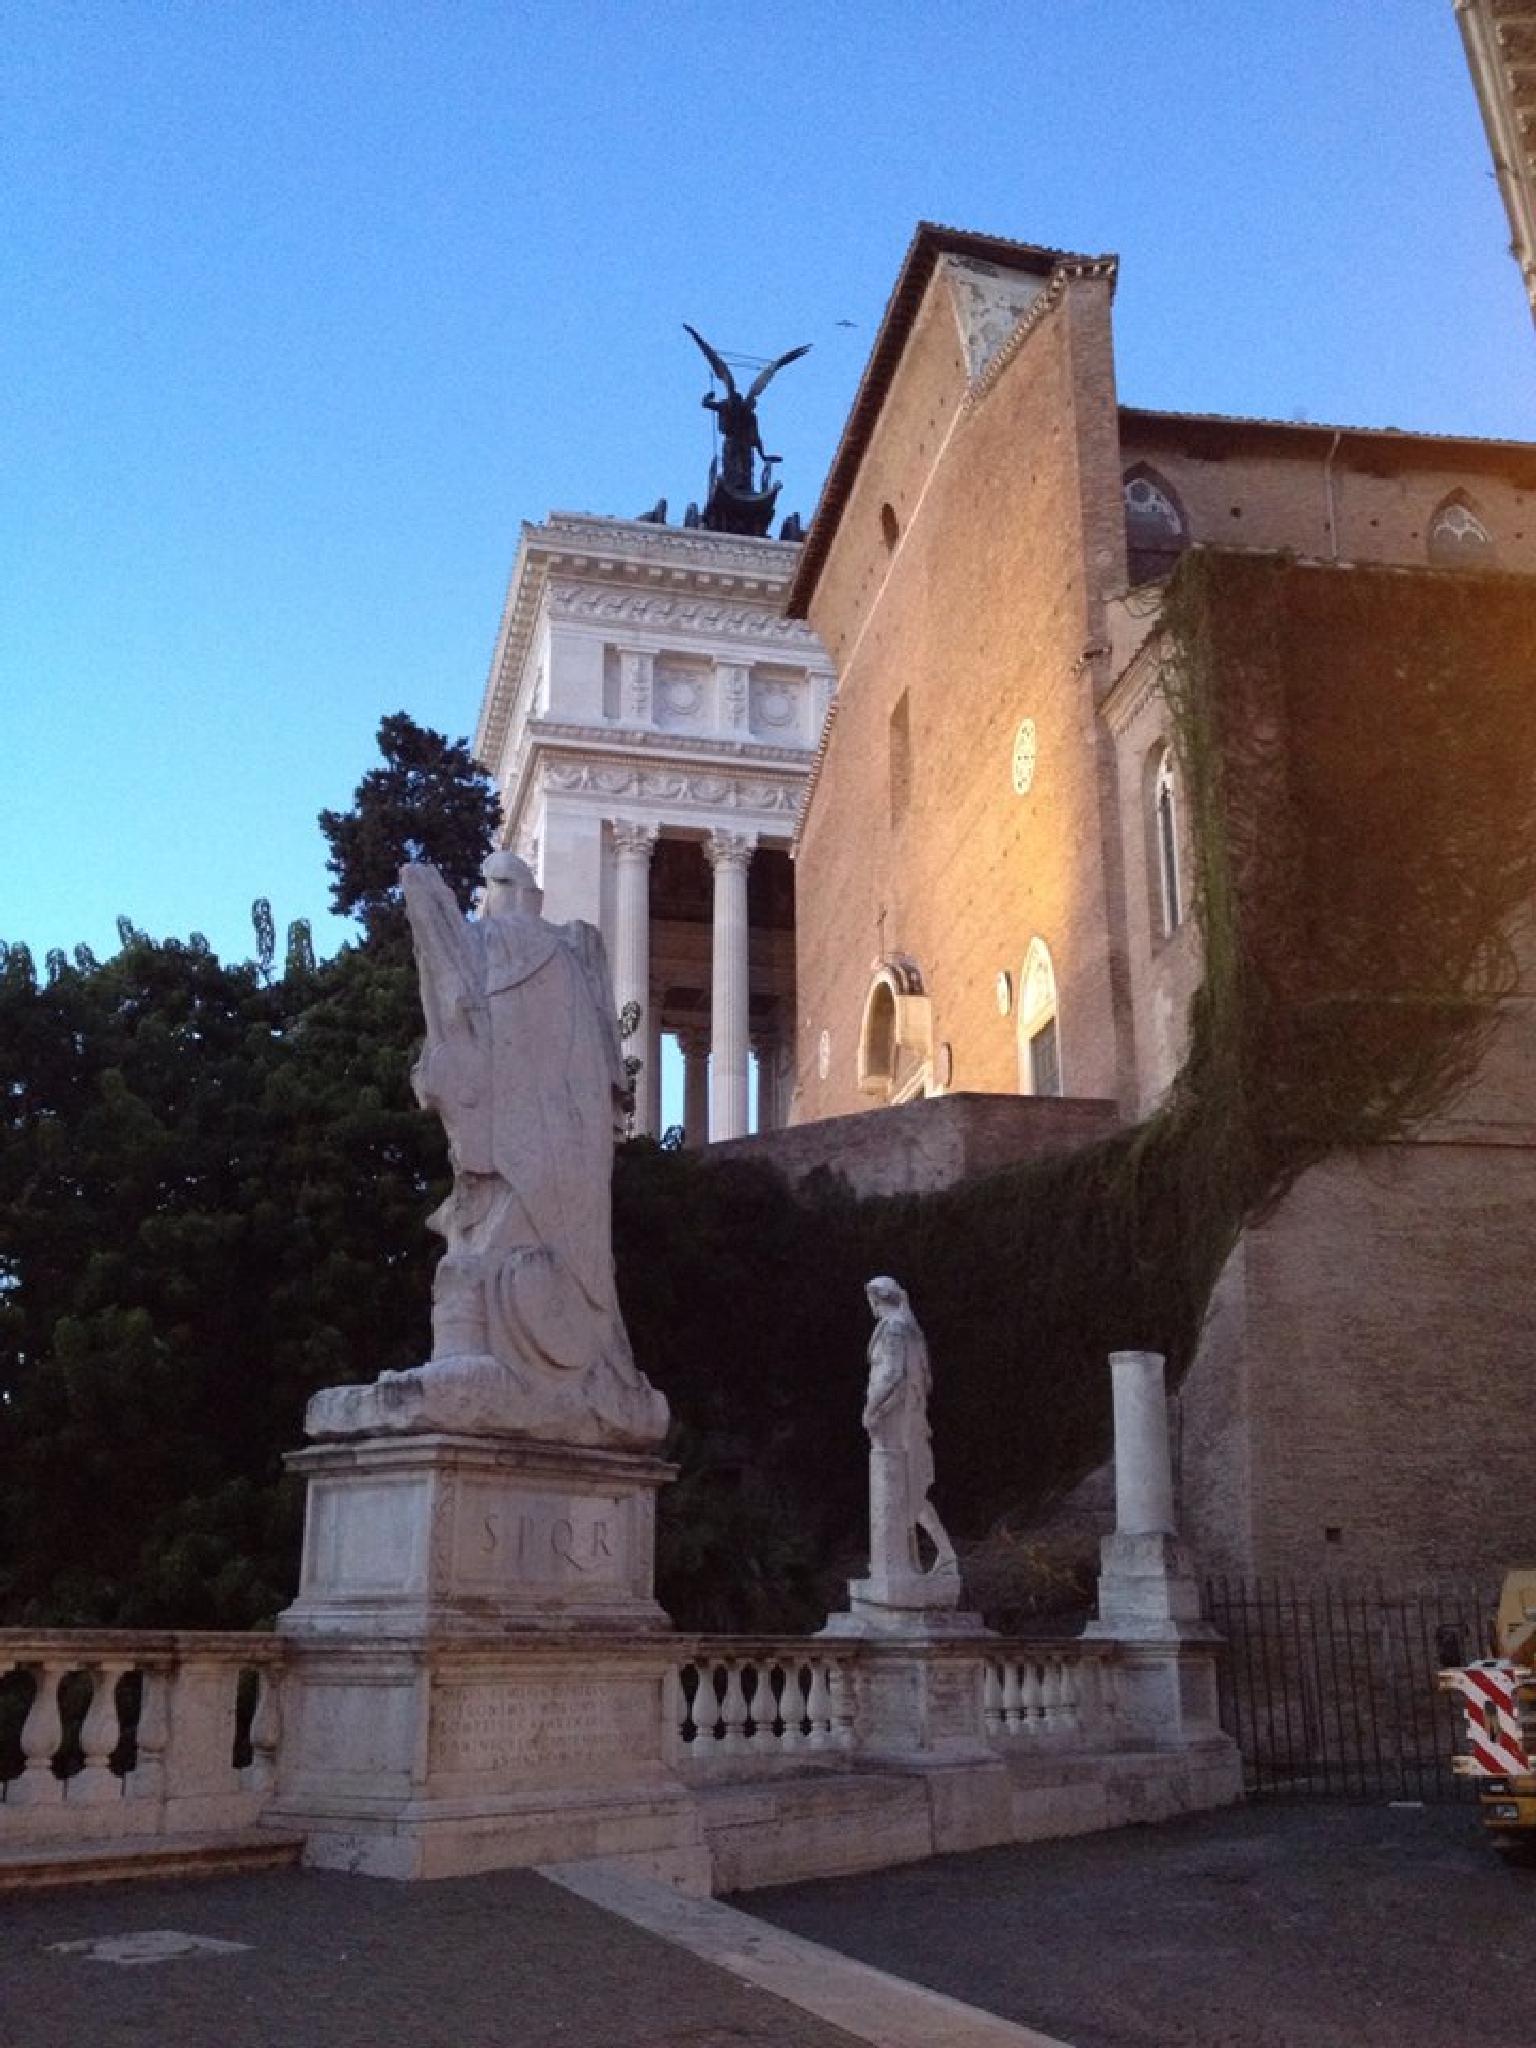 Ara Coeli, Rome by grossiroma